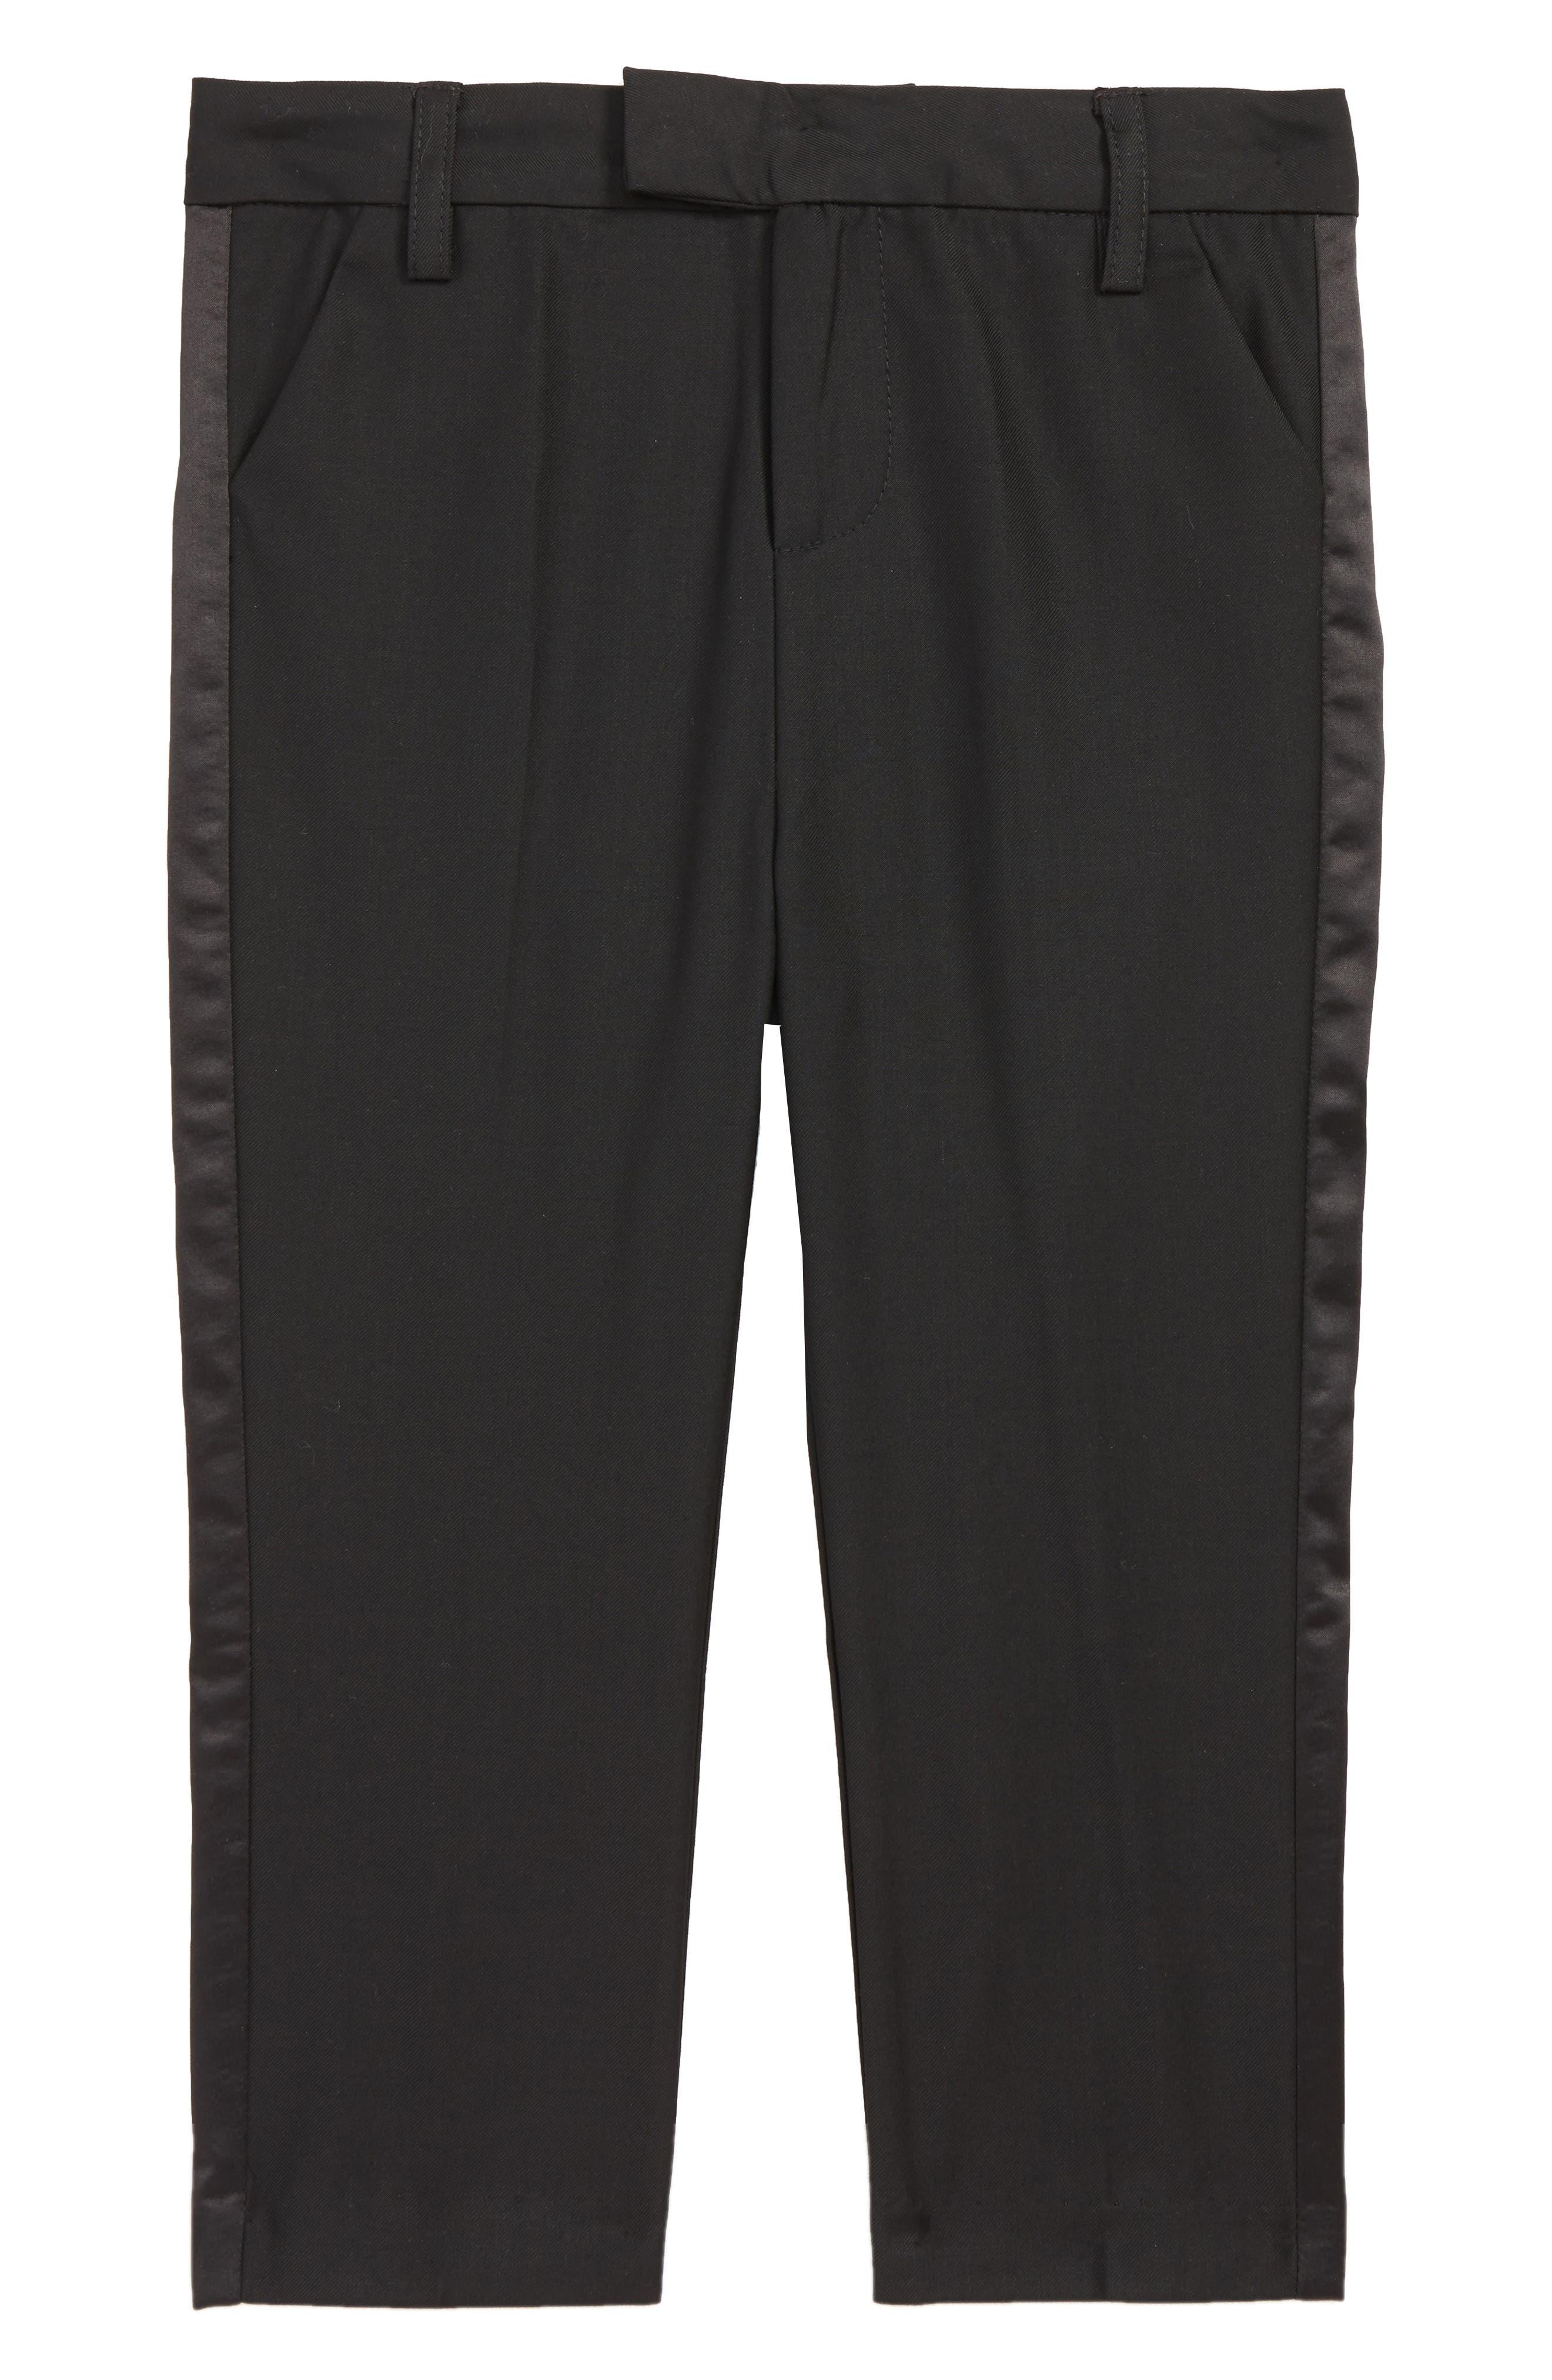 Toddler Boys Bardot Junior Tuxedo Pants Size 2T US  3 AUS  Black